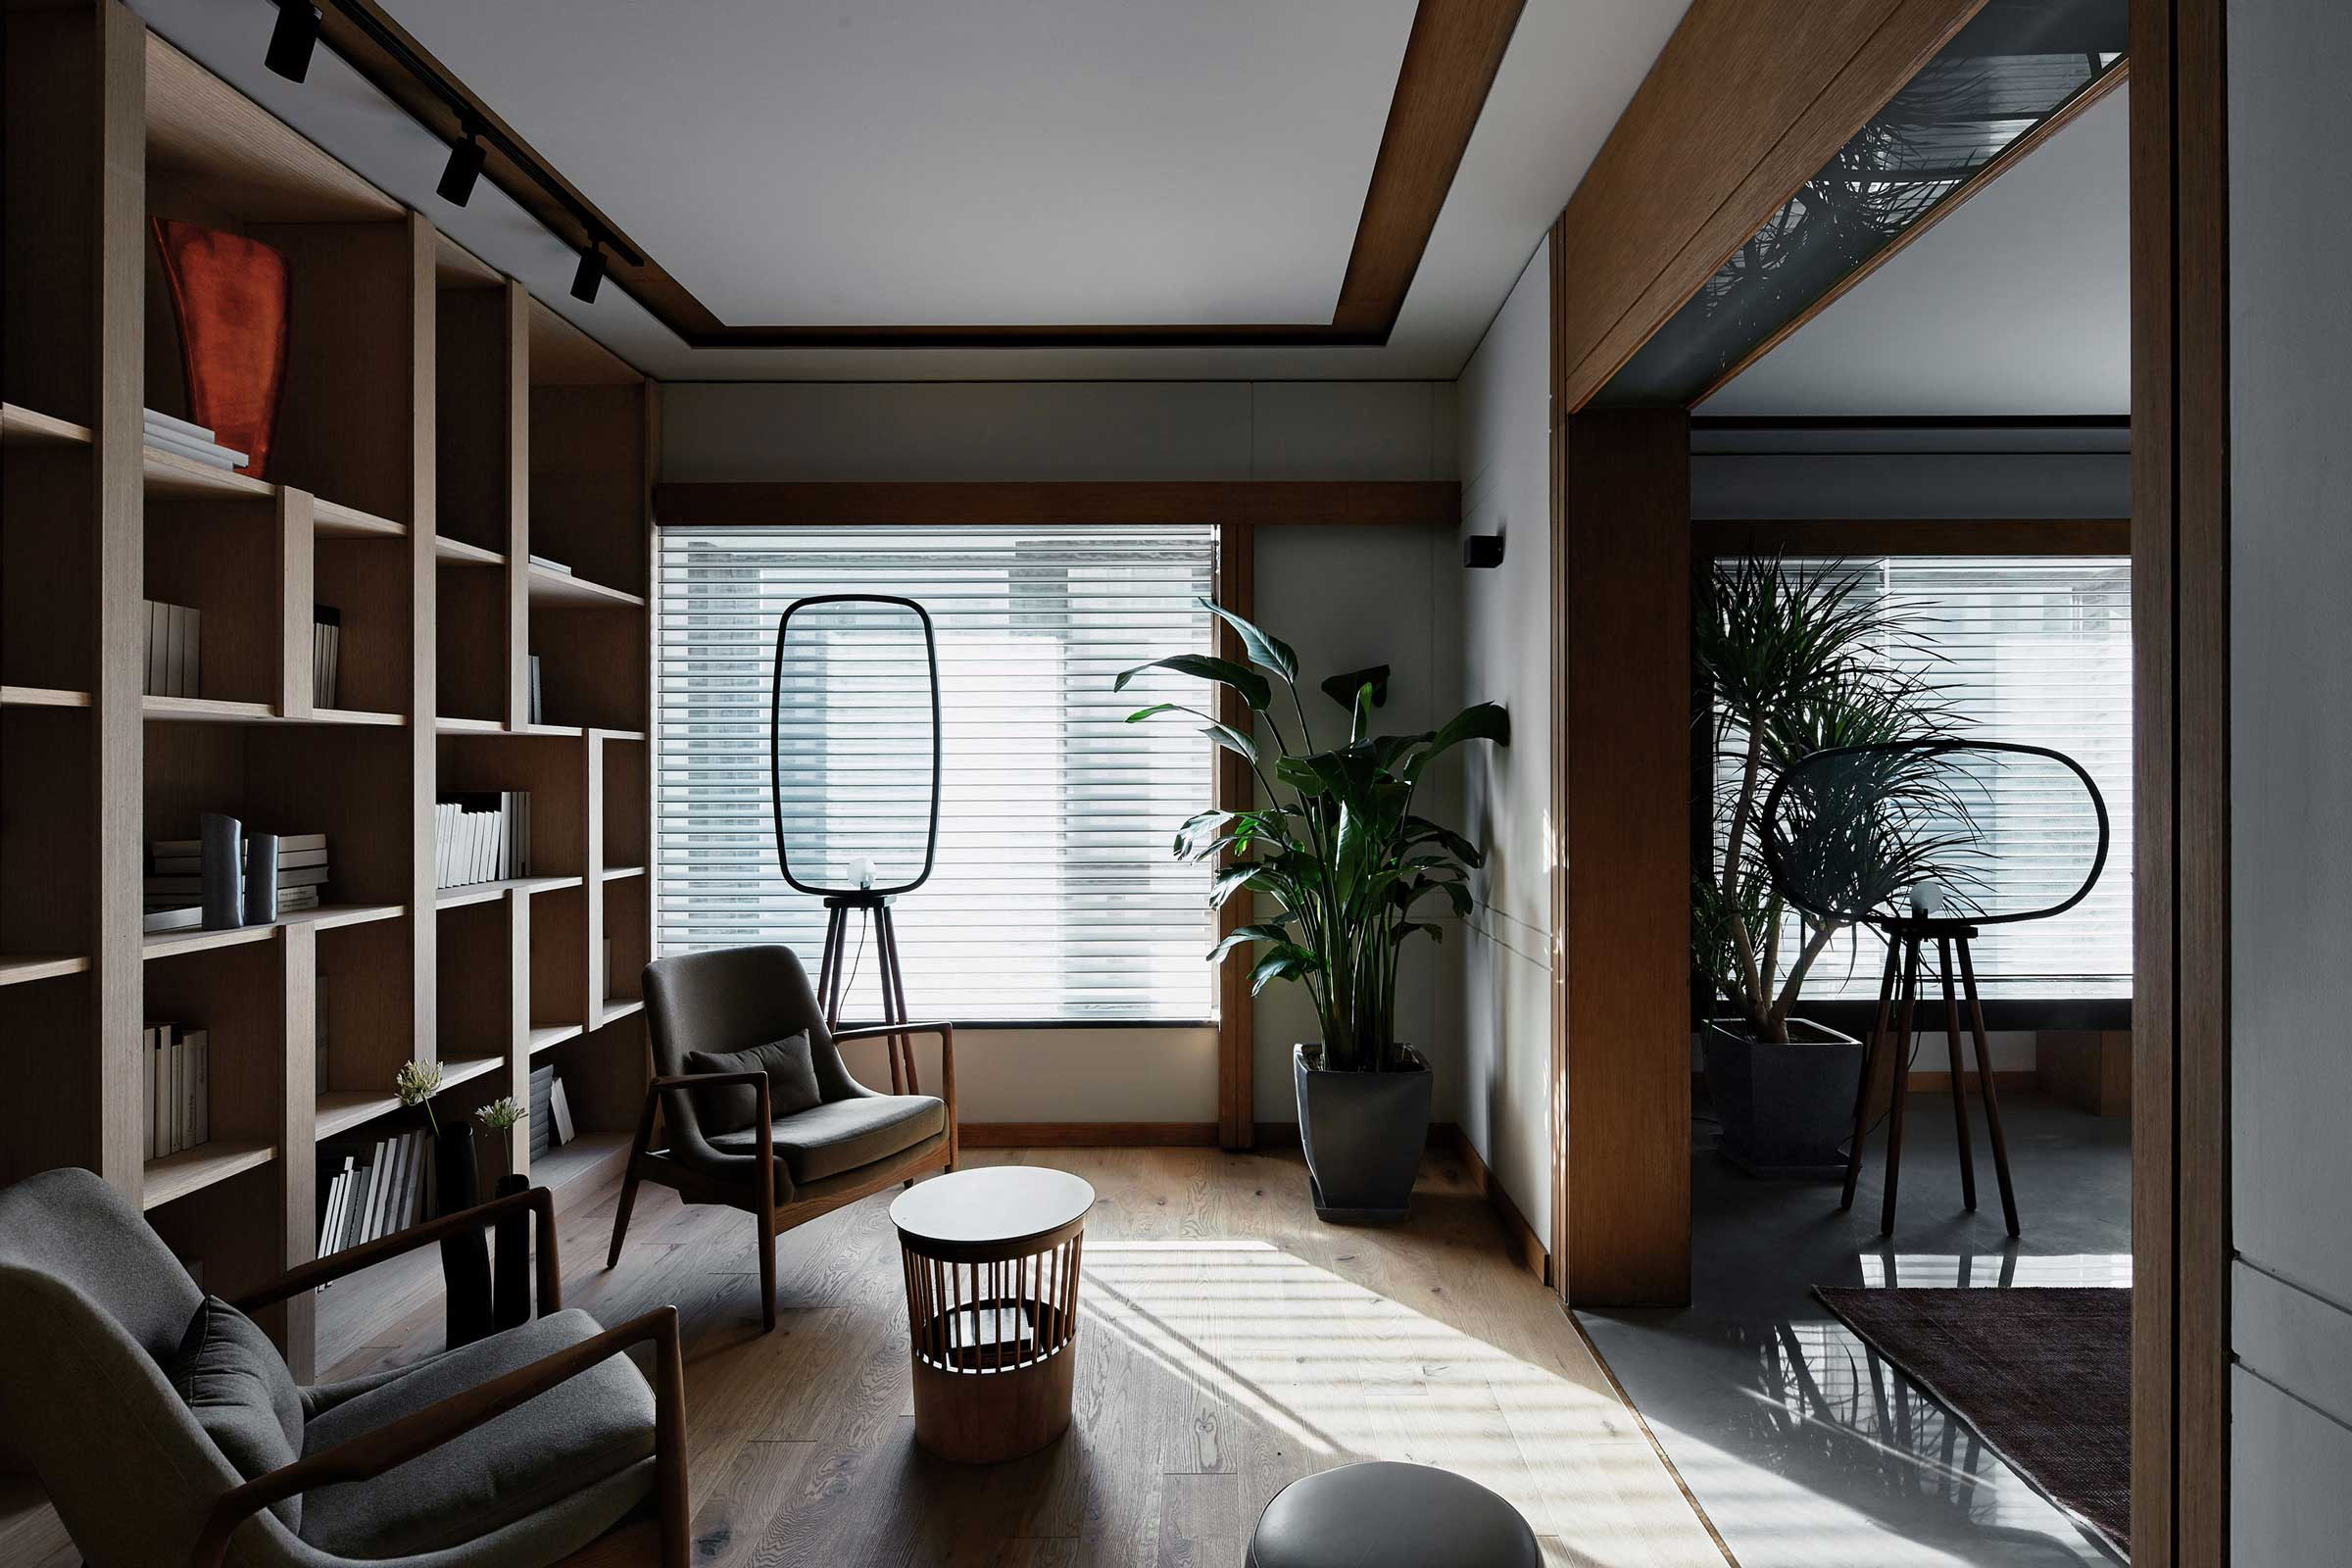 lane-house-ARCHISTRY-nolan-chao-04-study-room.jpg